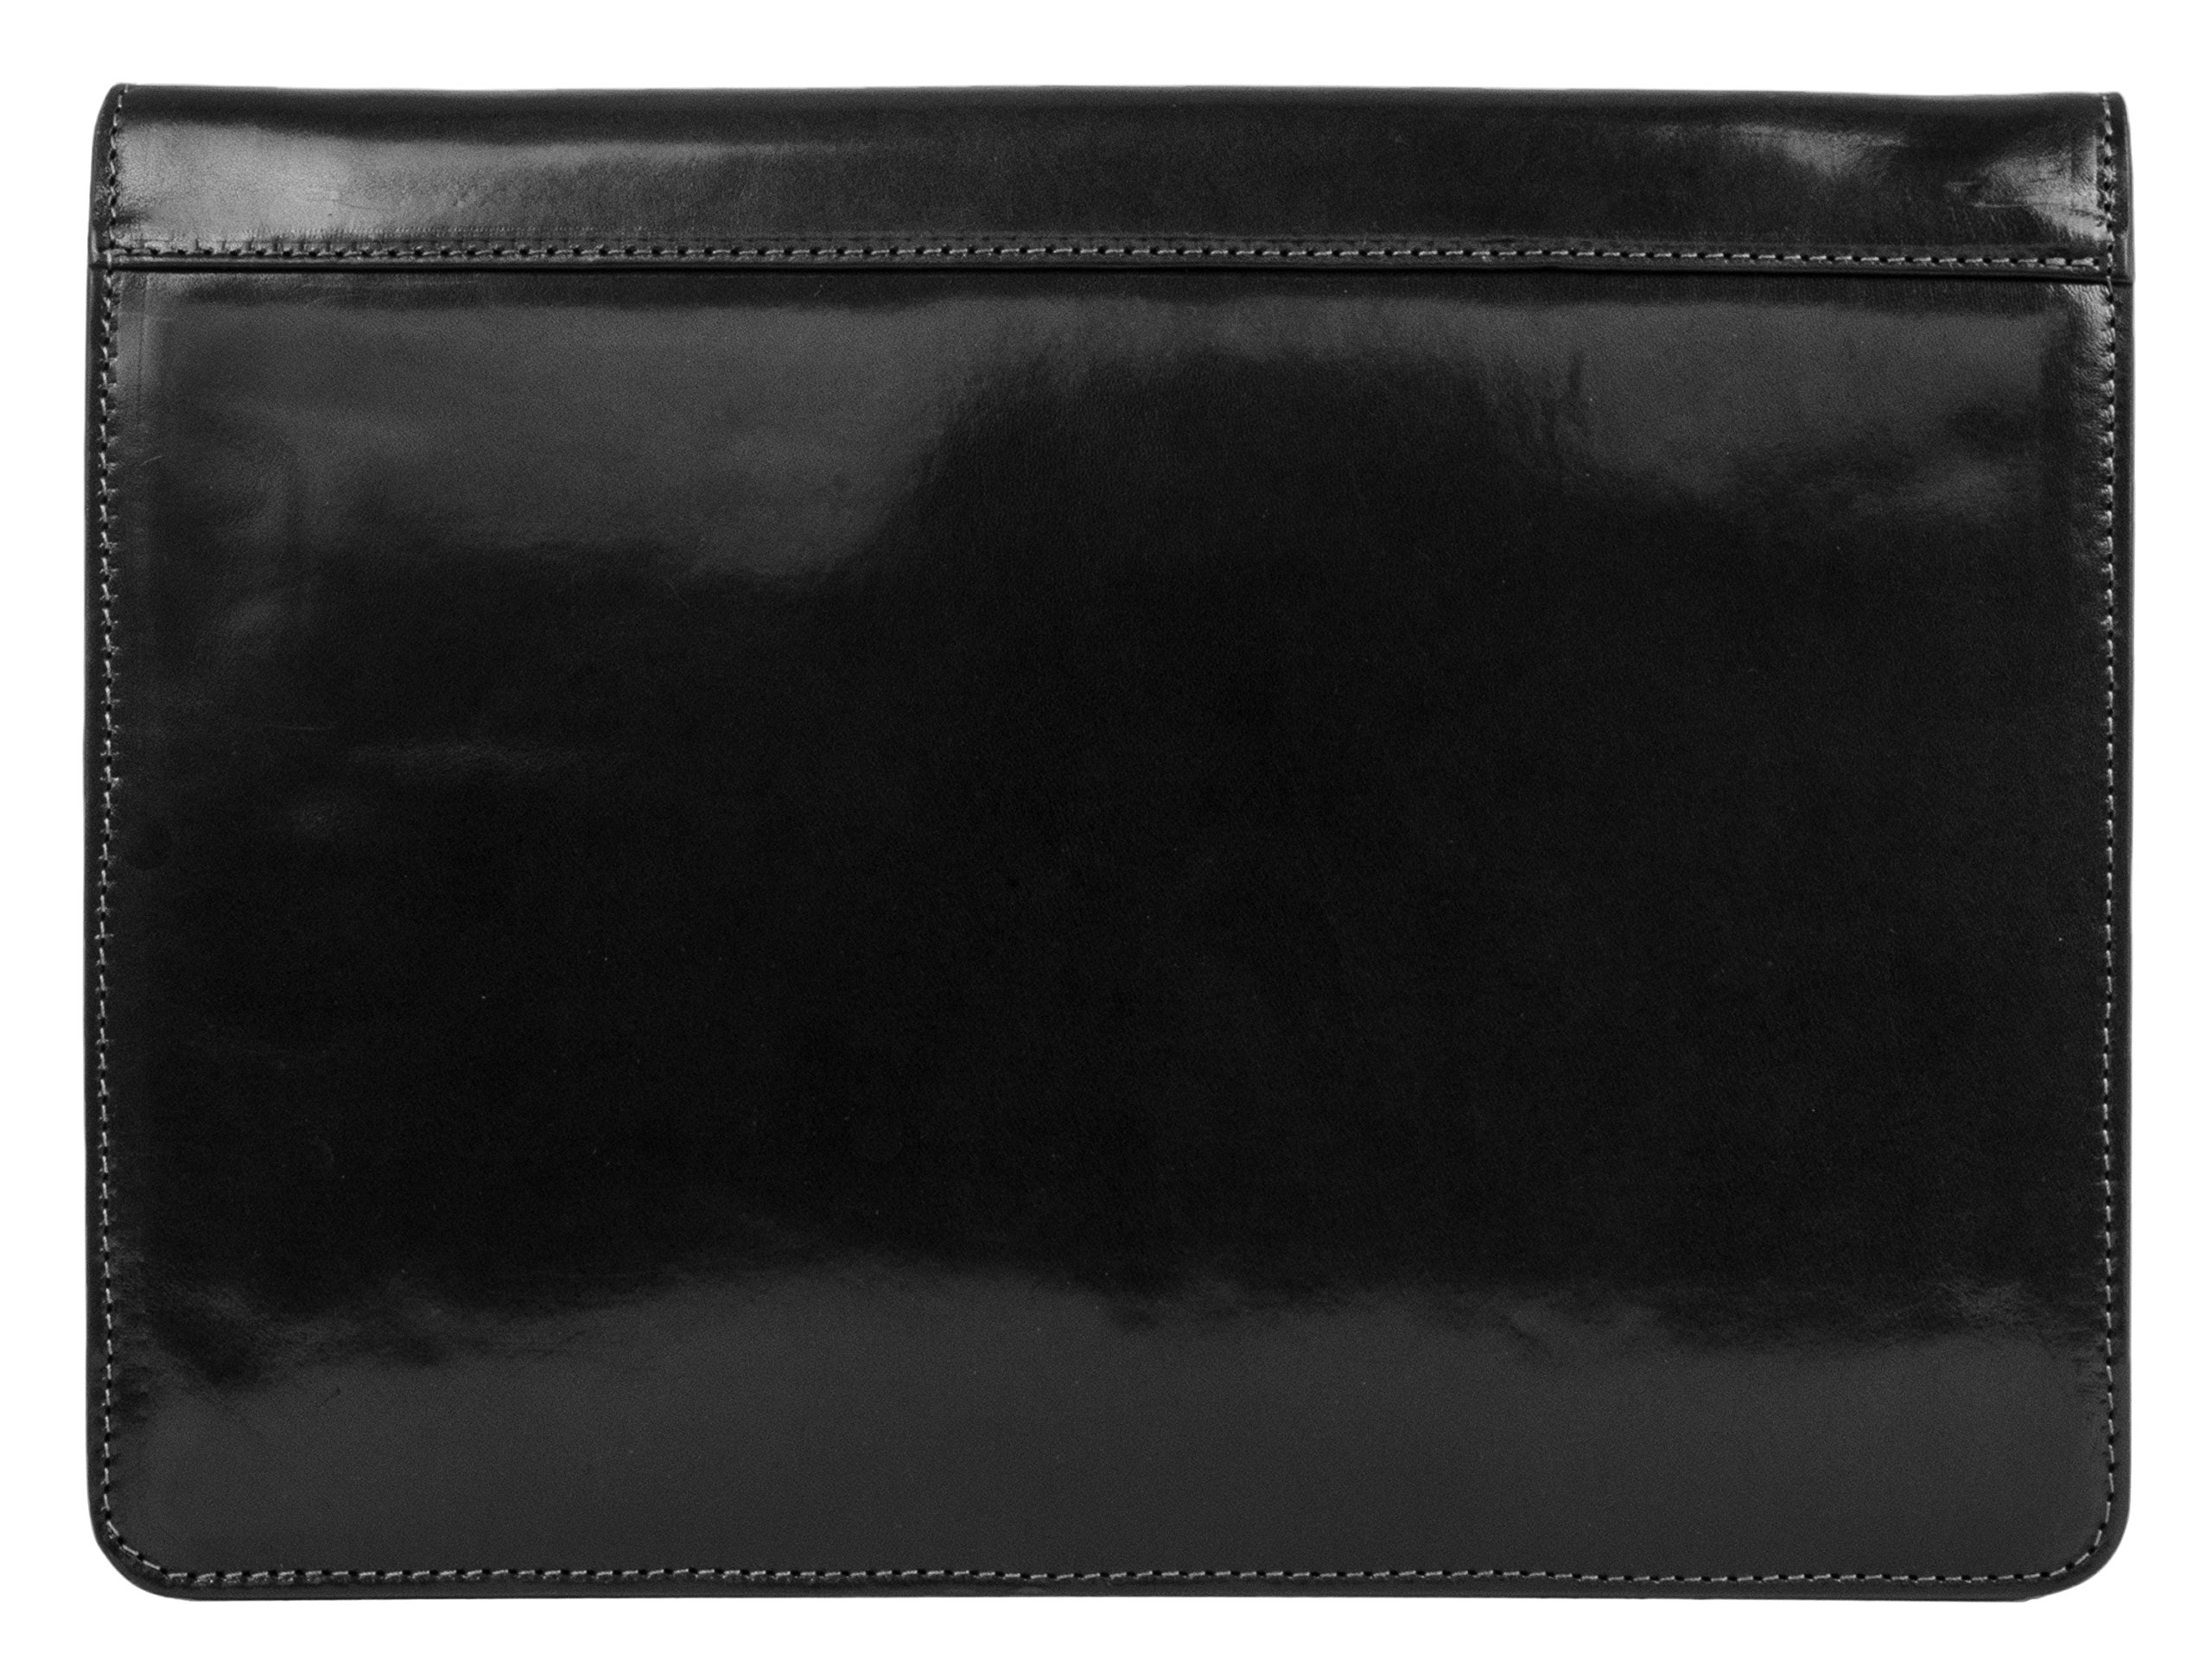 Leather Document Folder, Black Leather Portfolio, Leather Organizer, Document Holder - Time Resistance